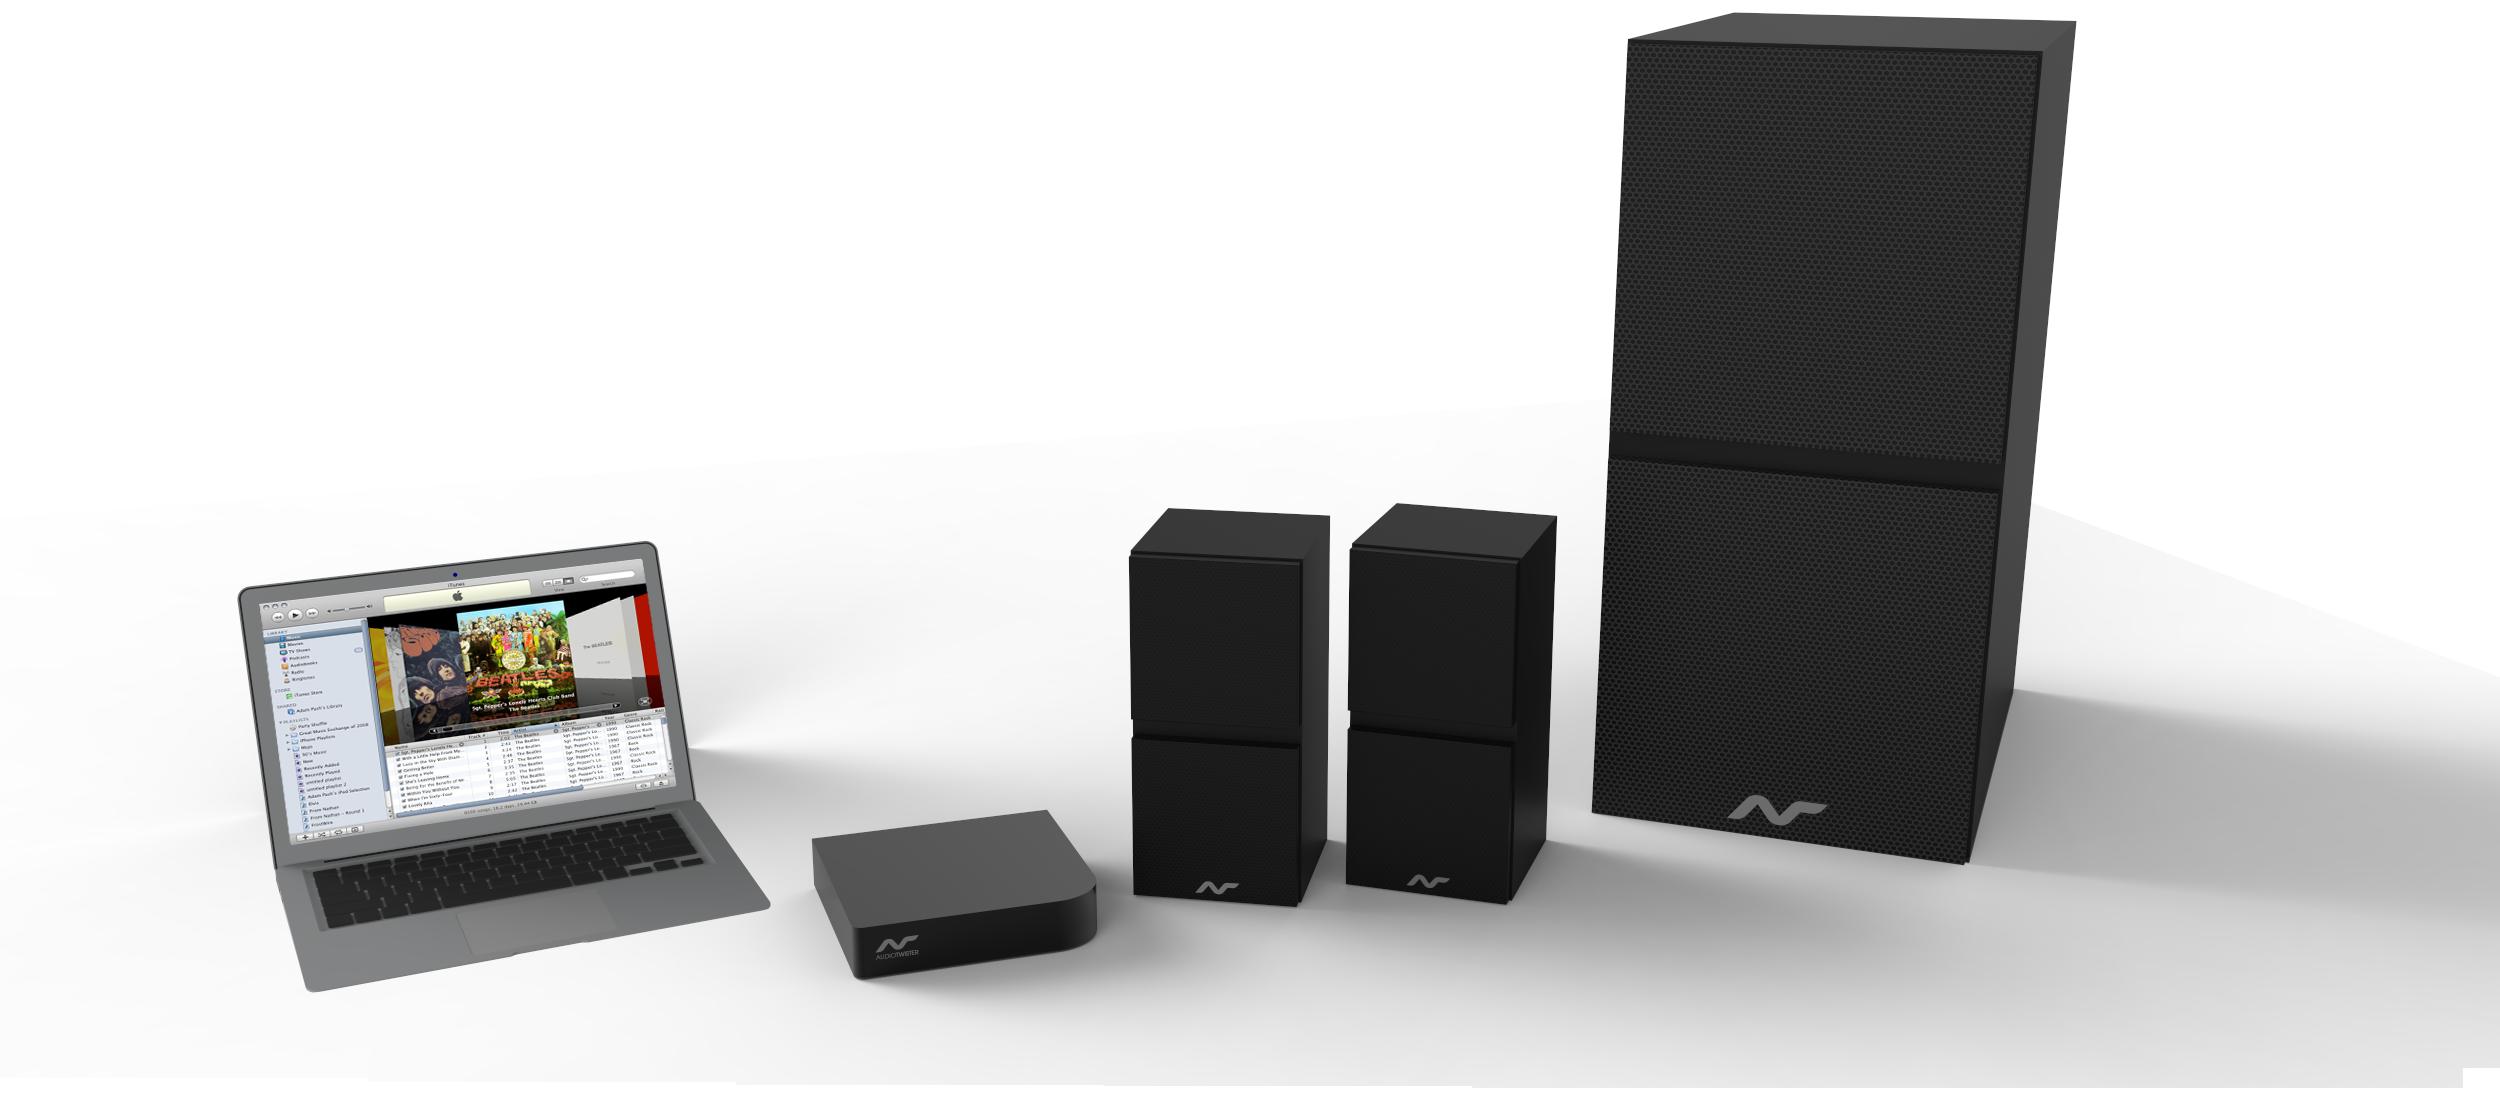 audiotwister soundsysteme f r zu hause und business. Black Bedroom Furniture Sets. Home Design Ideas